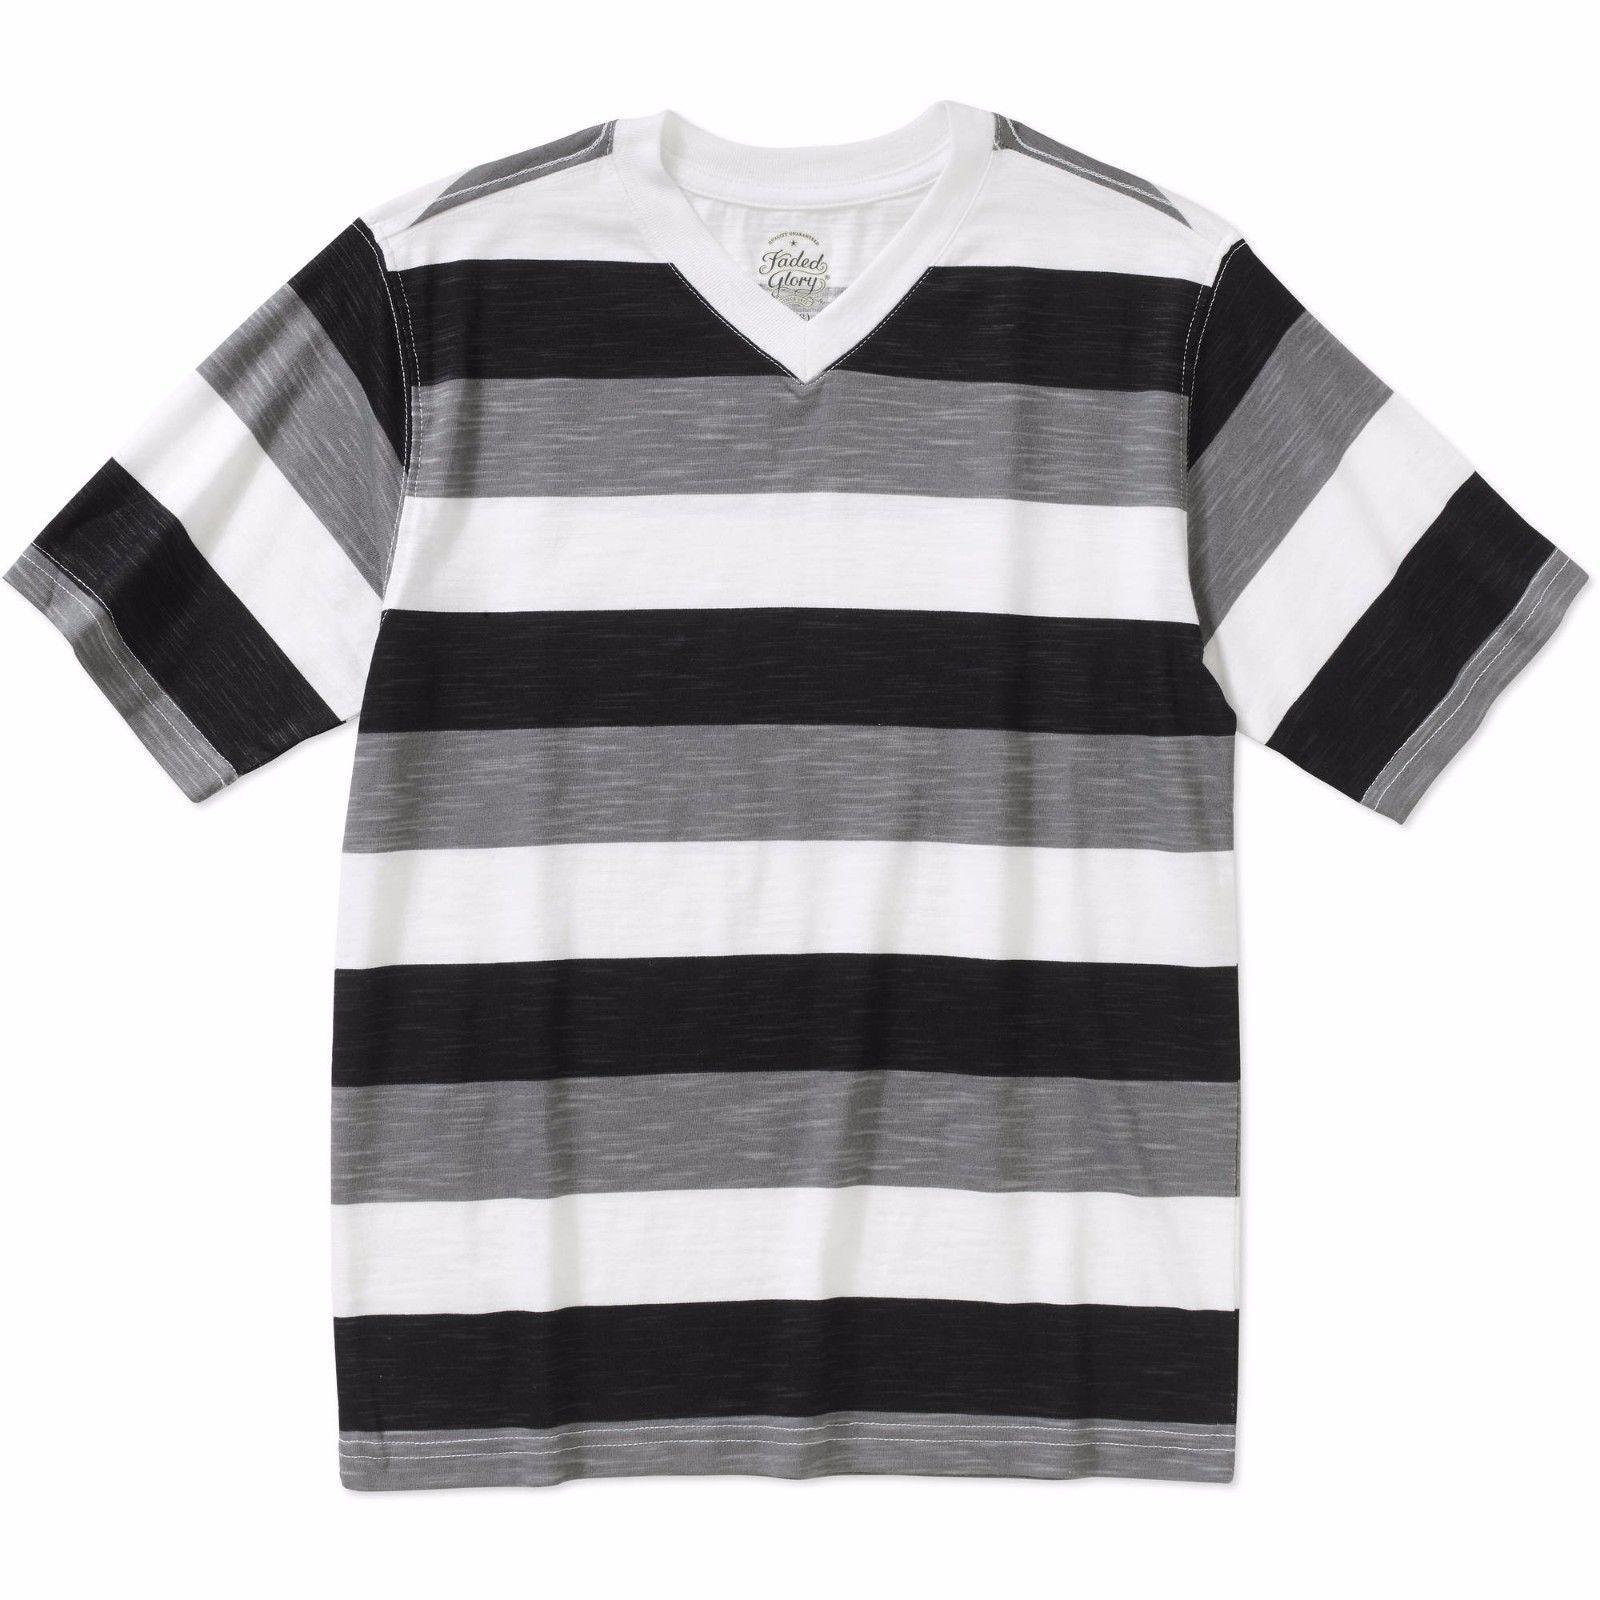 20b408ff79701 Faded Glory Boys Short Sleeve Rugby V Neck T Shirt Black Soot Size 2XL 18 -   8.90